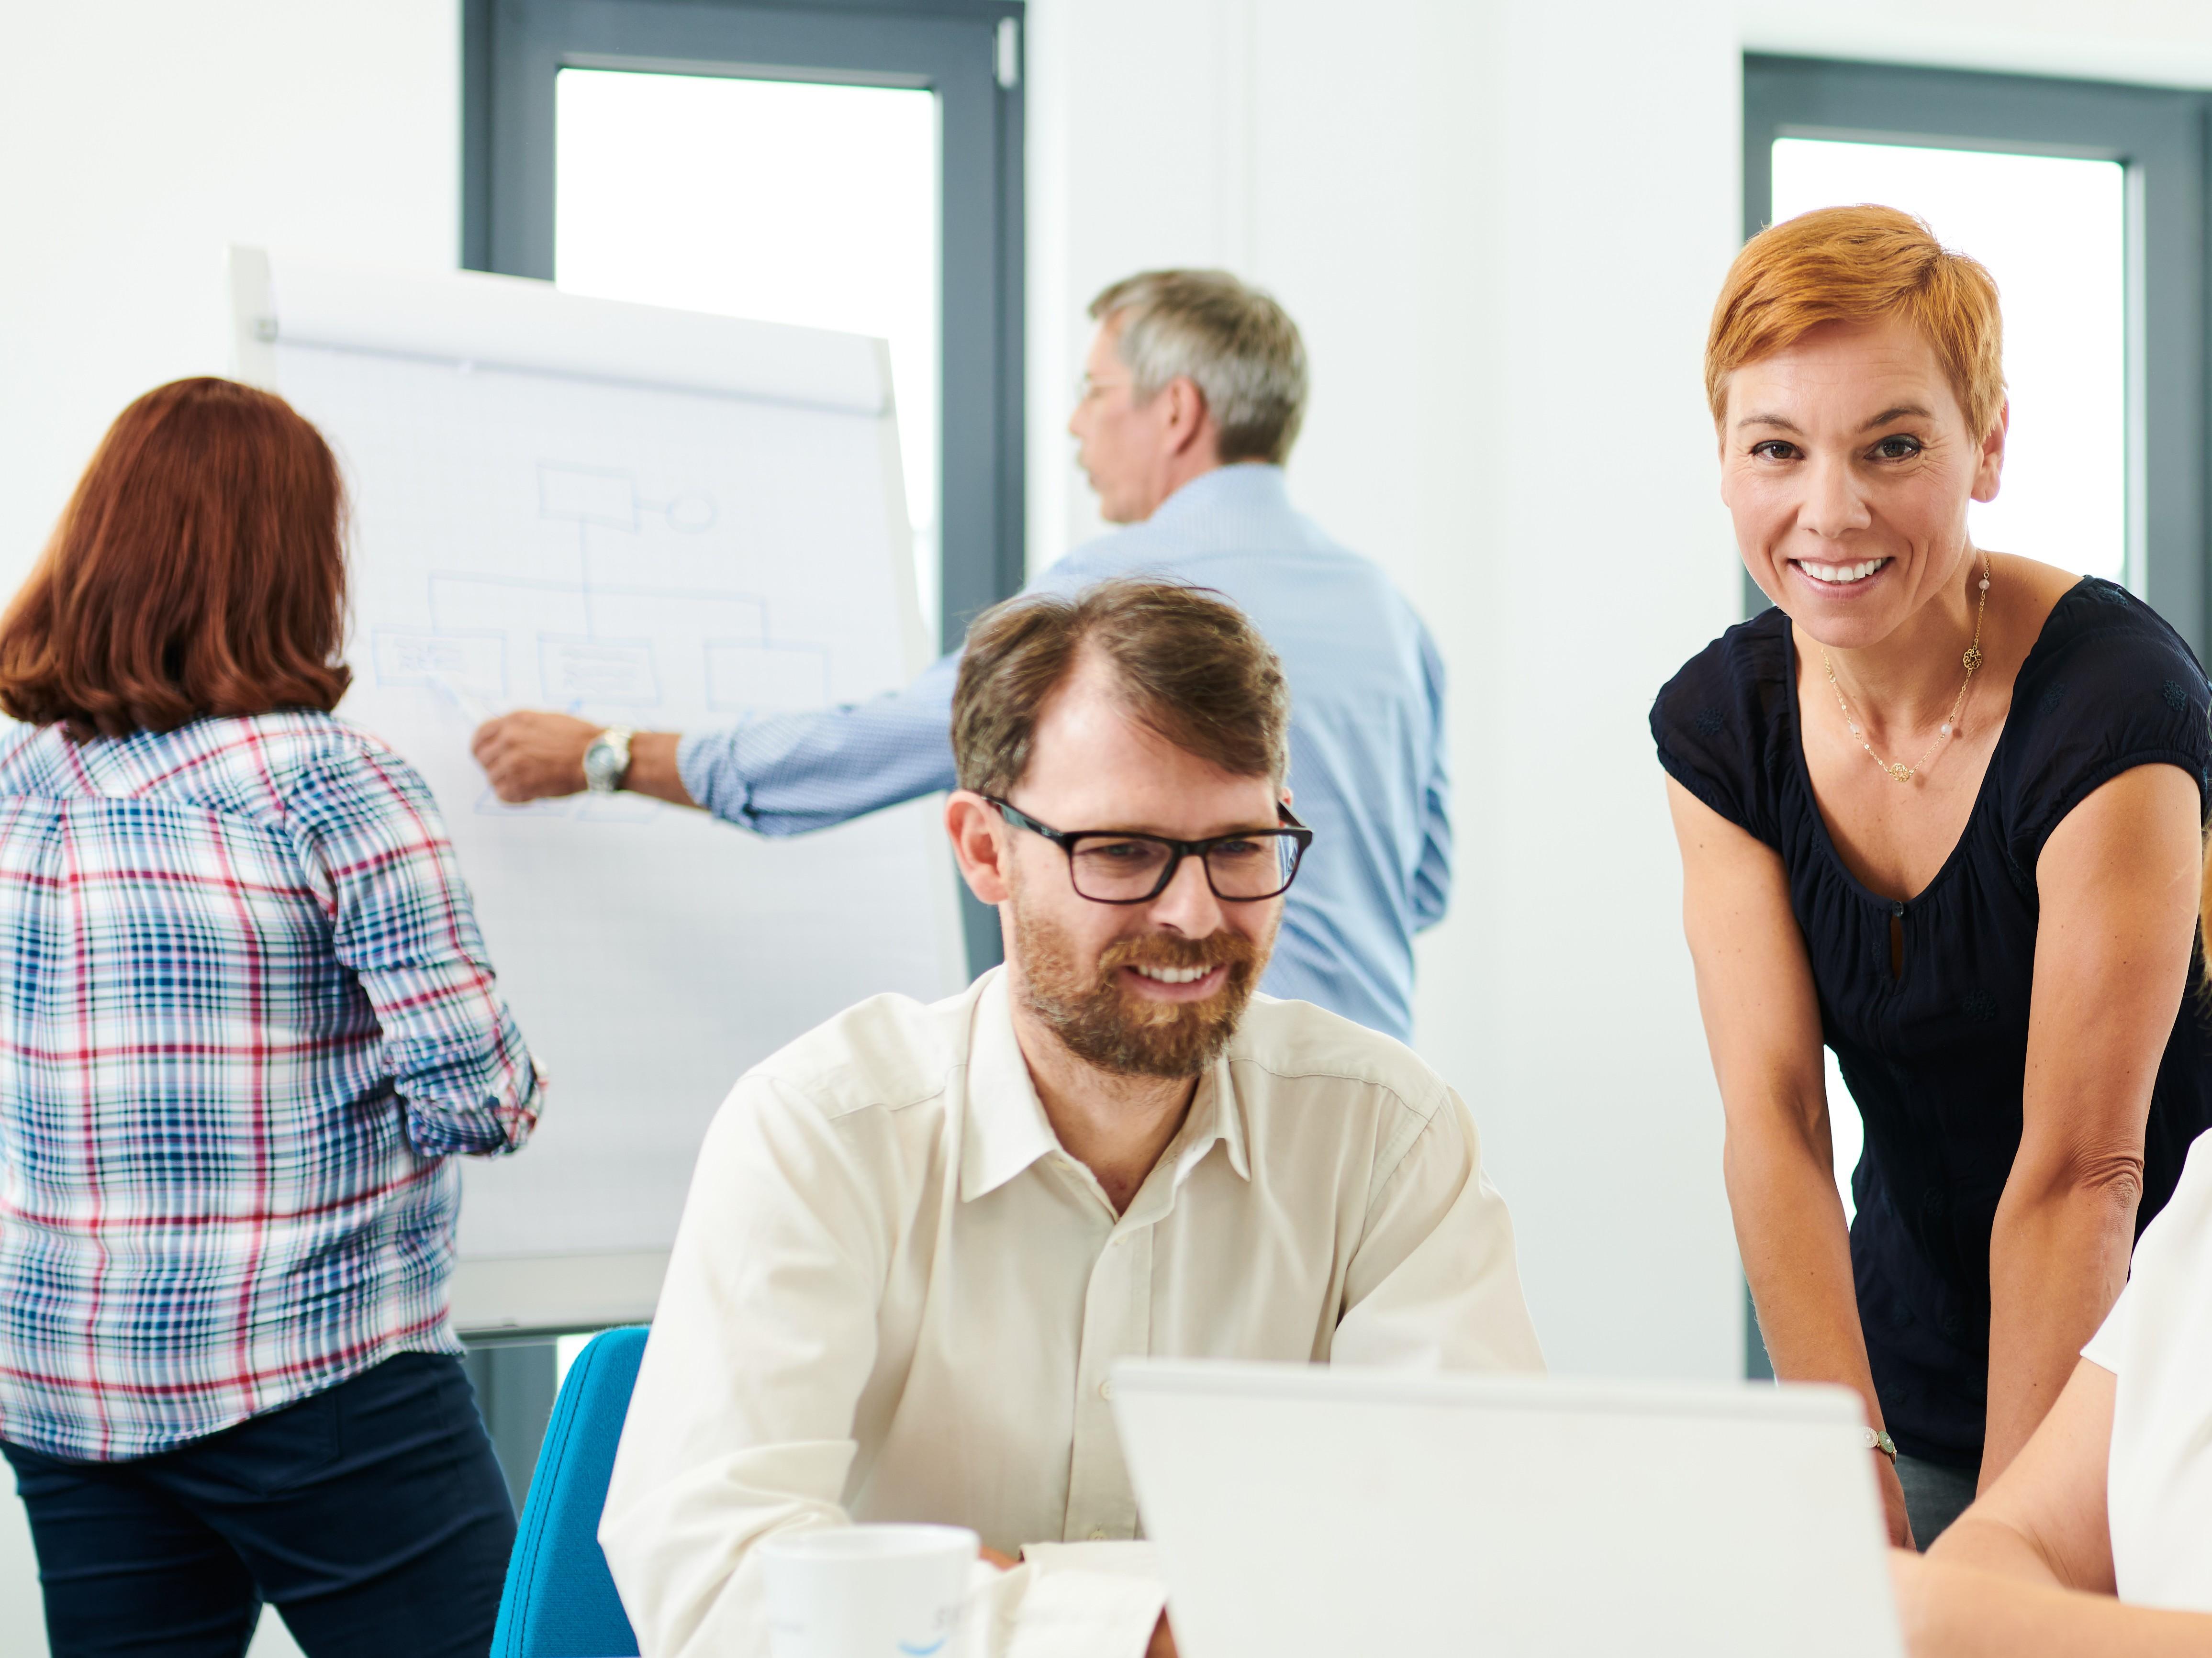 SAP S/4HANA Discovery Workshop